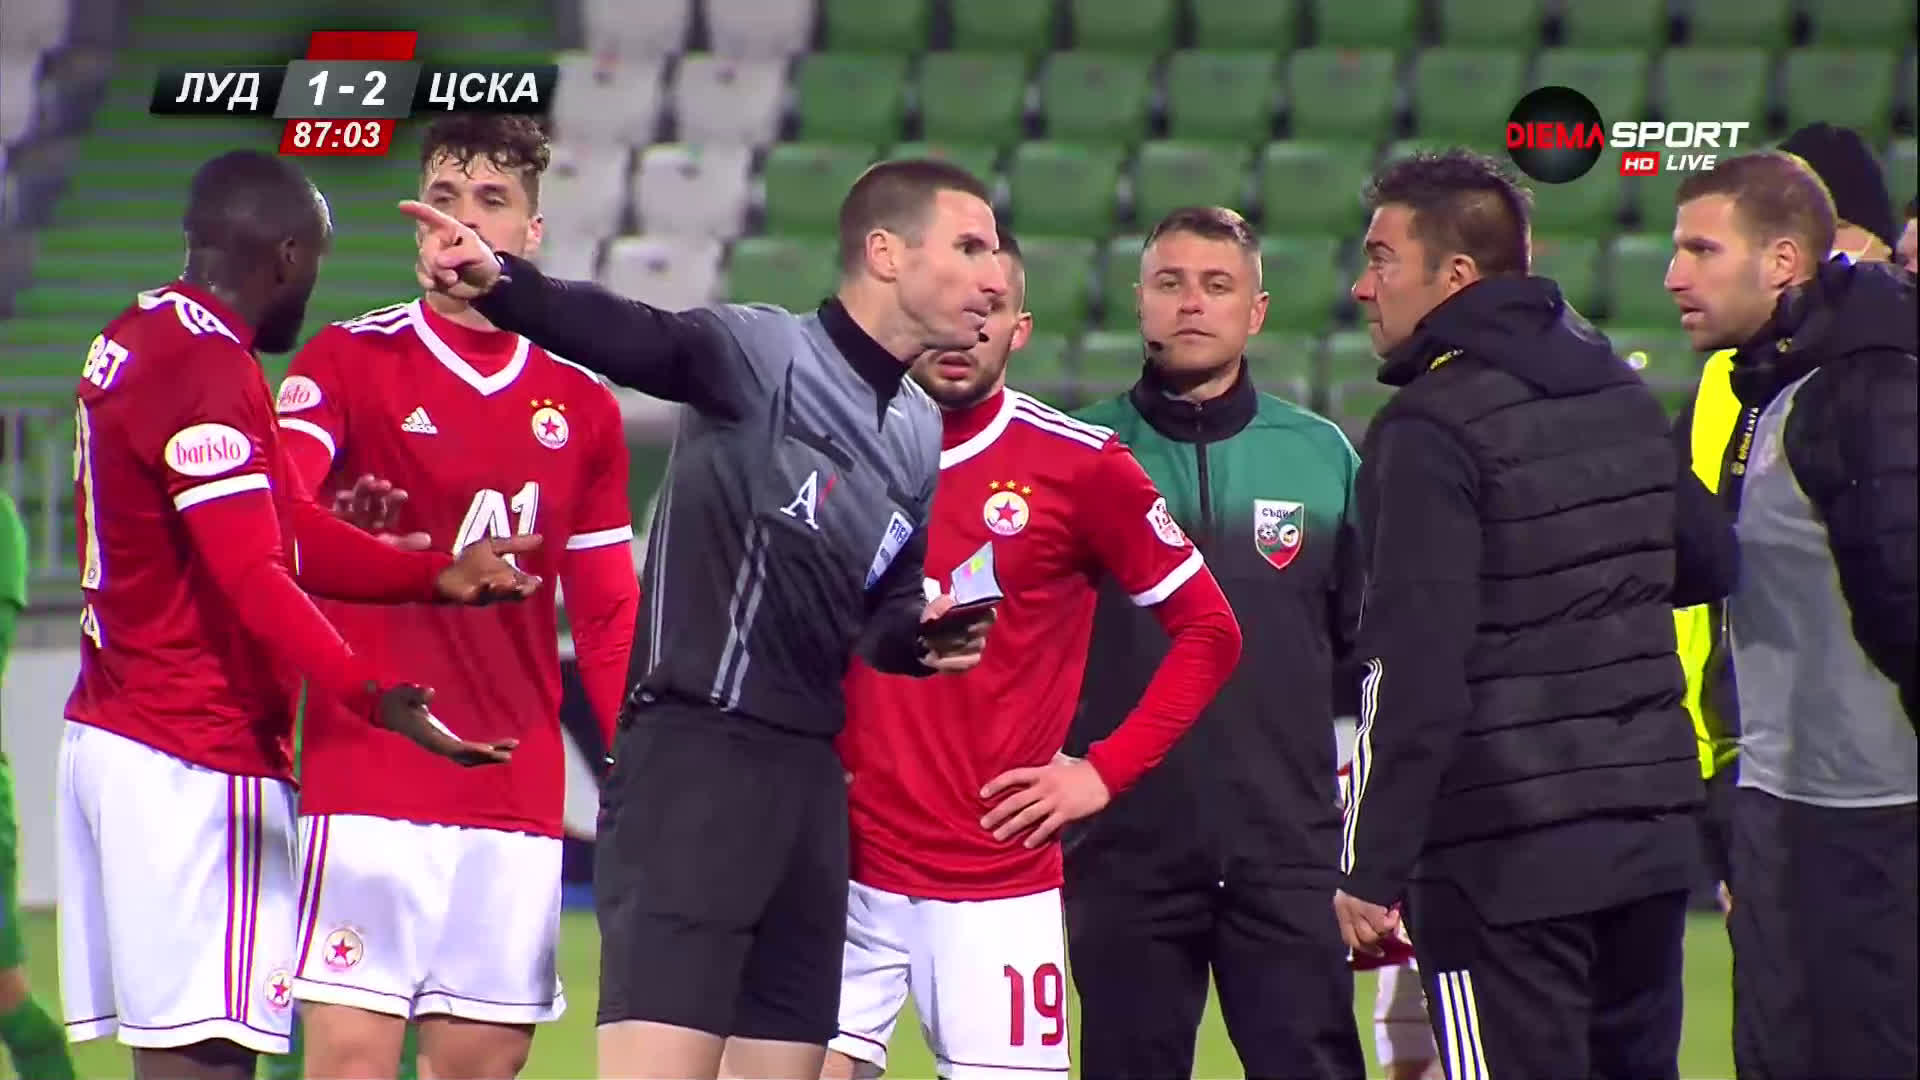 Изгониха Любо Пенев и двама играчи